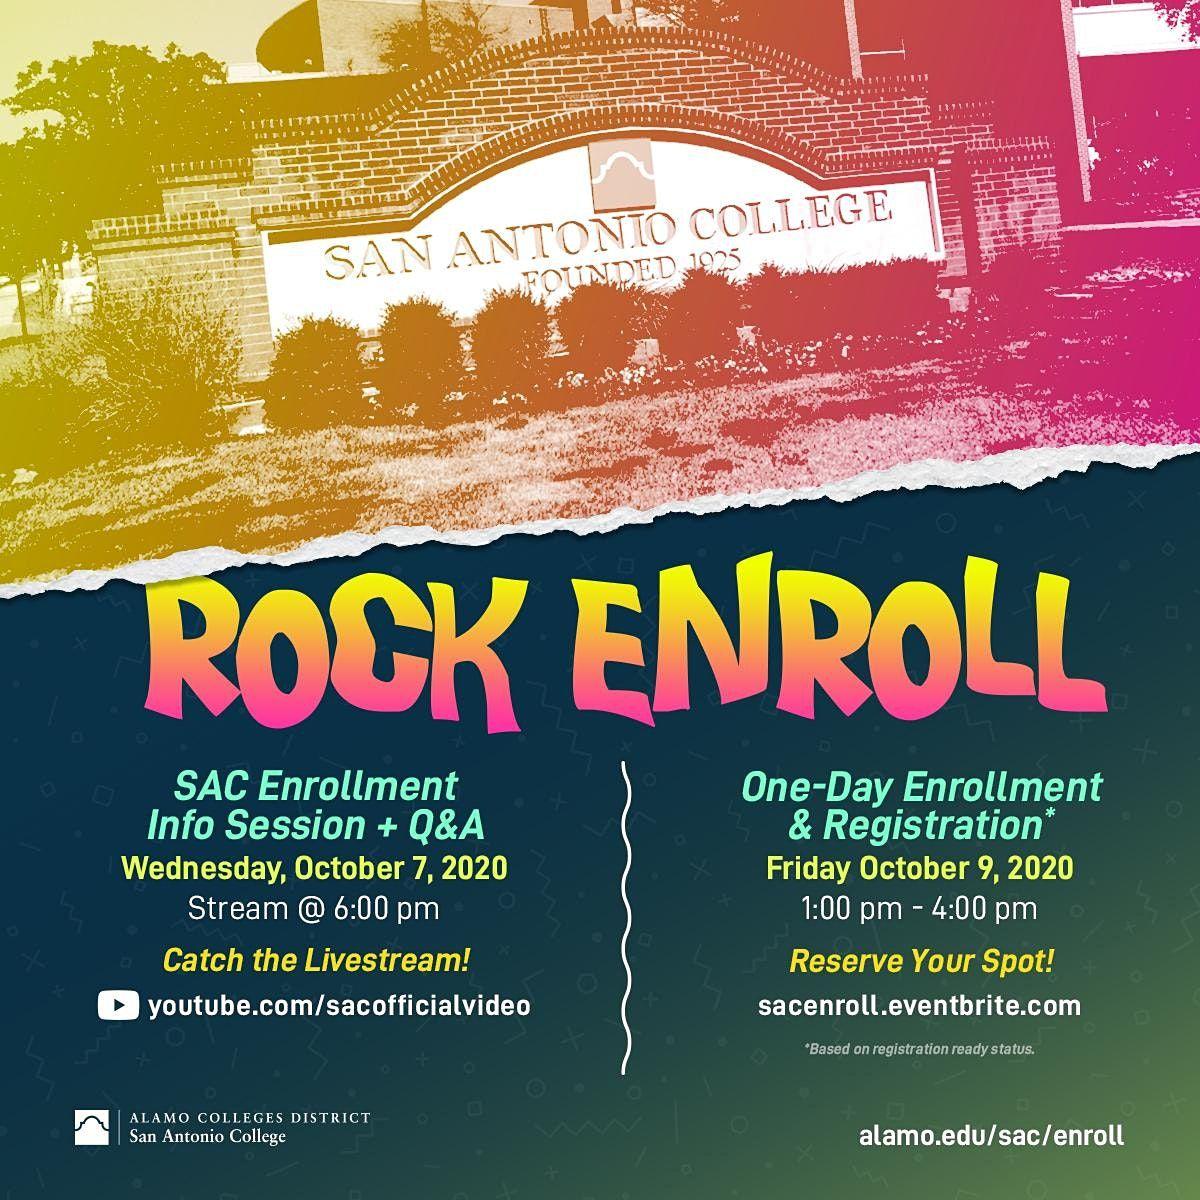 San Antonio College VIRTUAL & ON CAMPUS RALLY